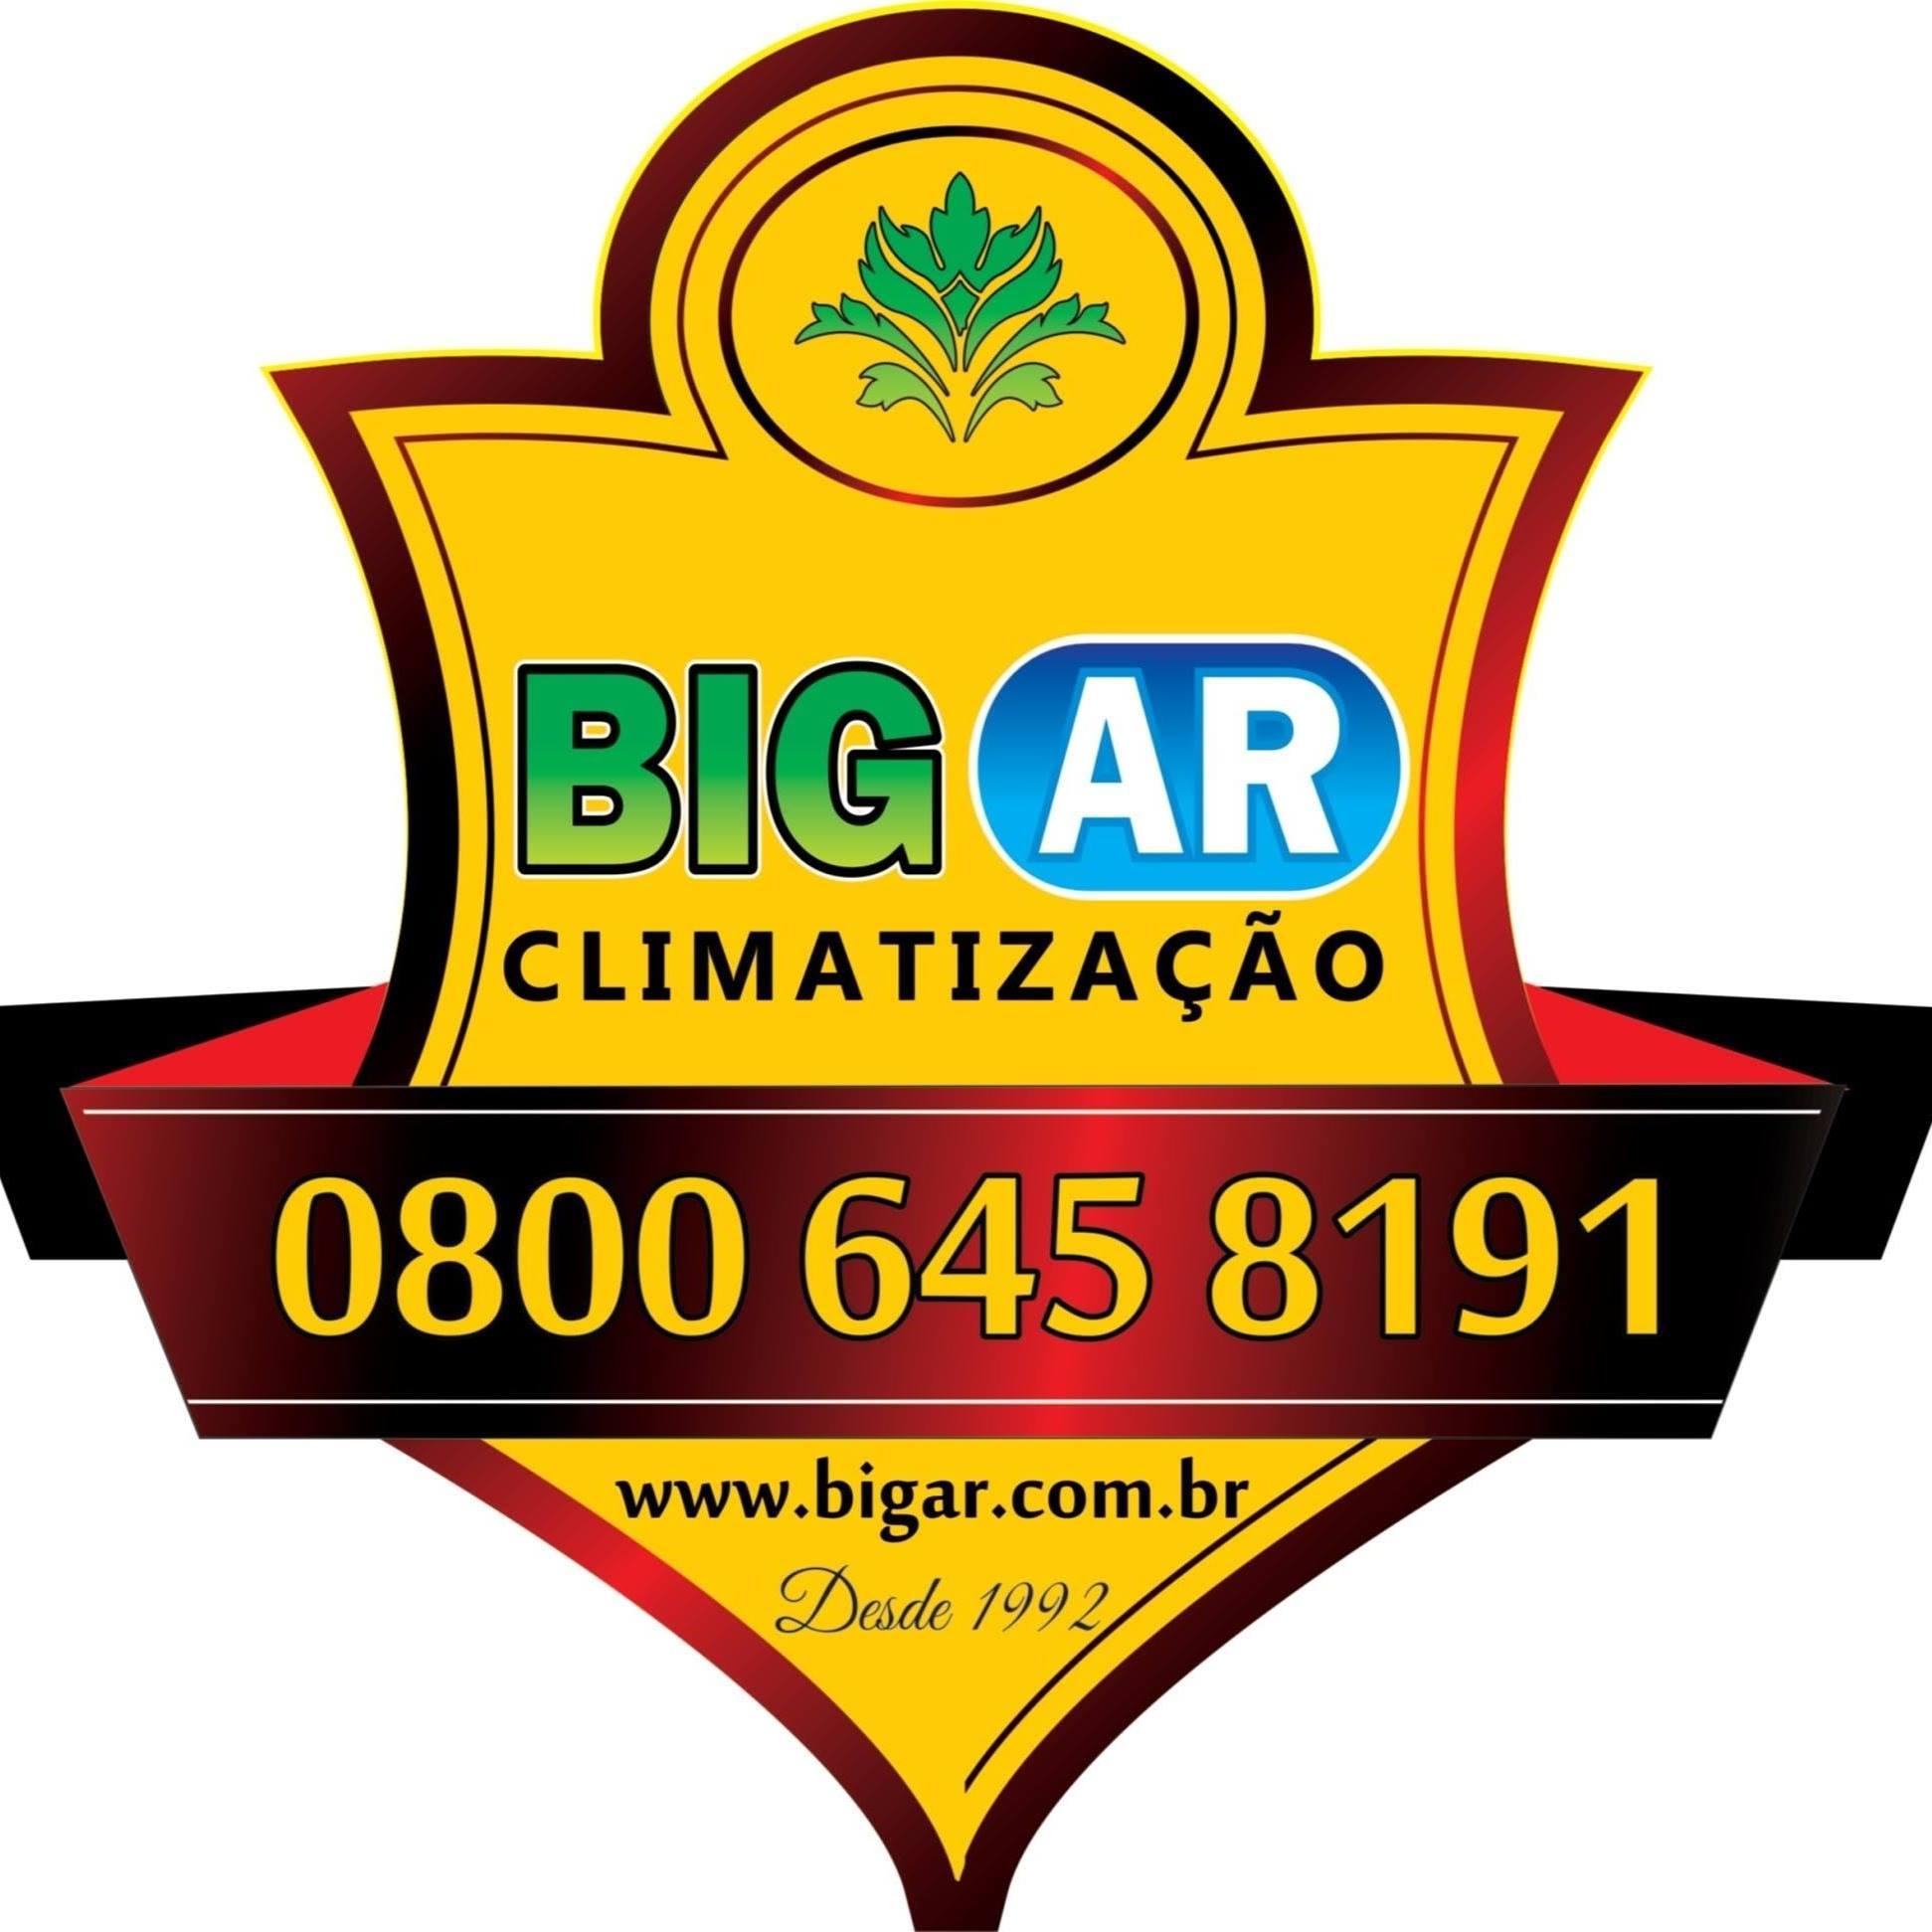 BigAr